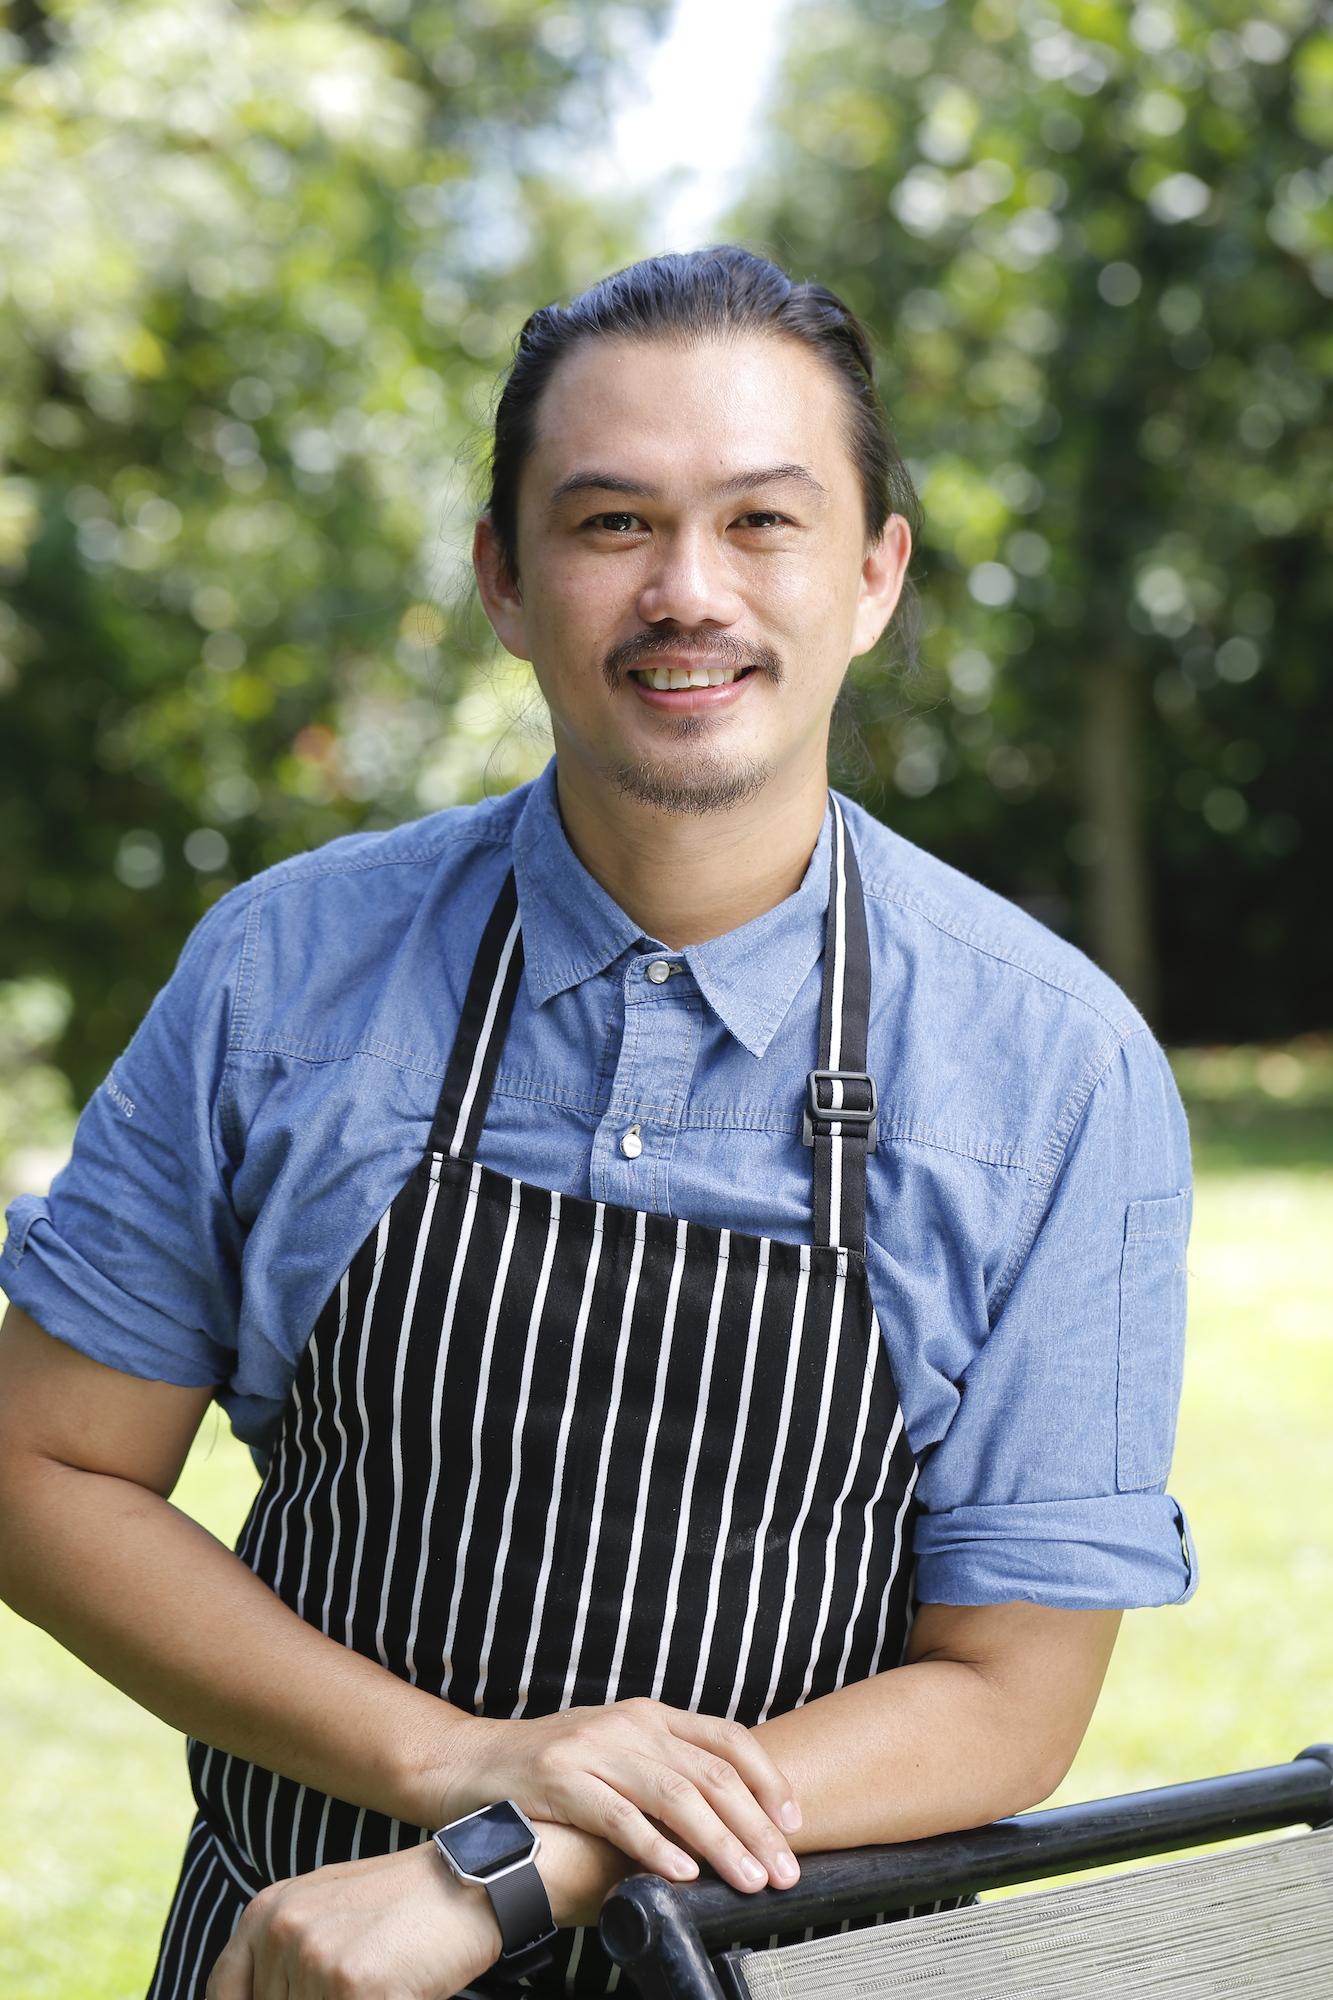 Raintree Hospitality Group corporate chef Kalel Chan